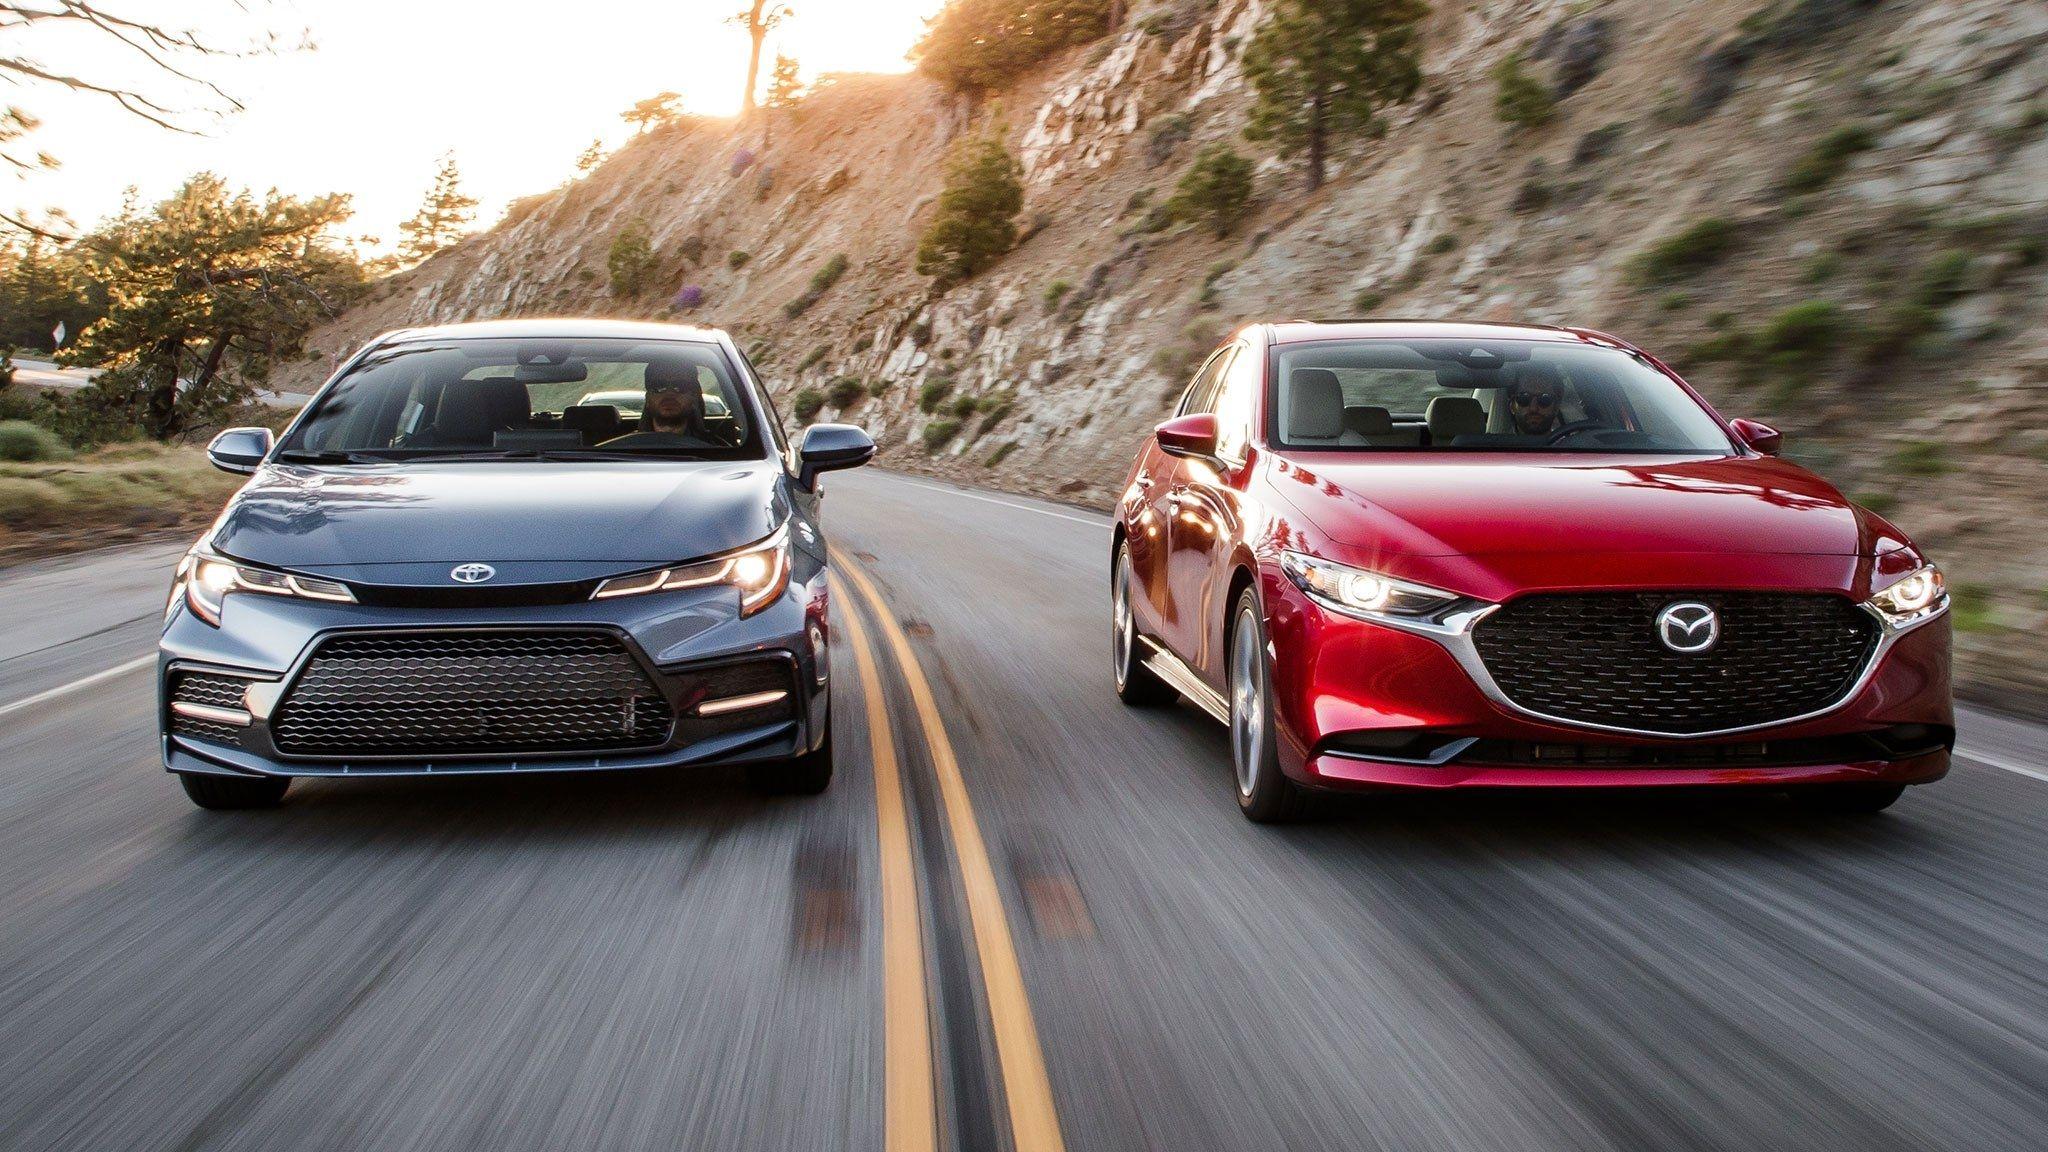 2020 Toyota Corolla Vs 2019 Mazda3 Compact Stalwarts Collide